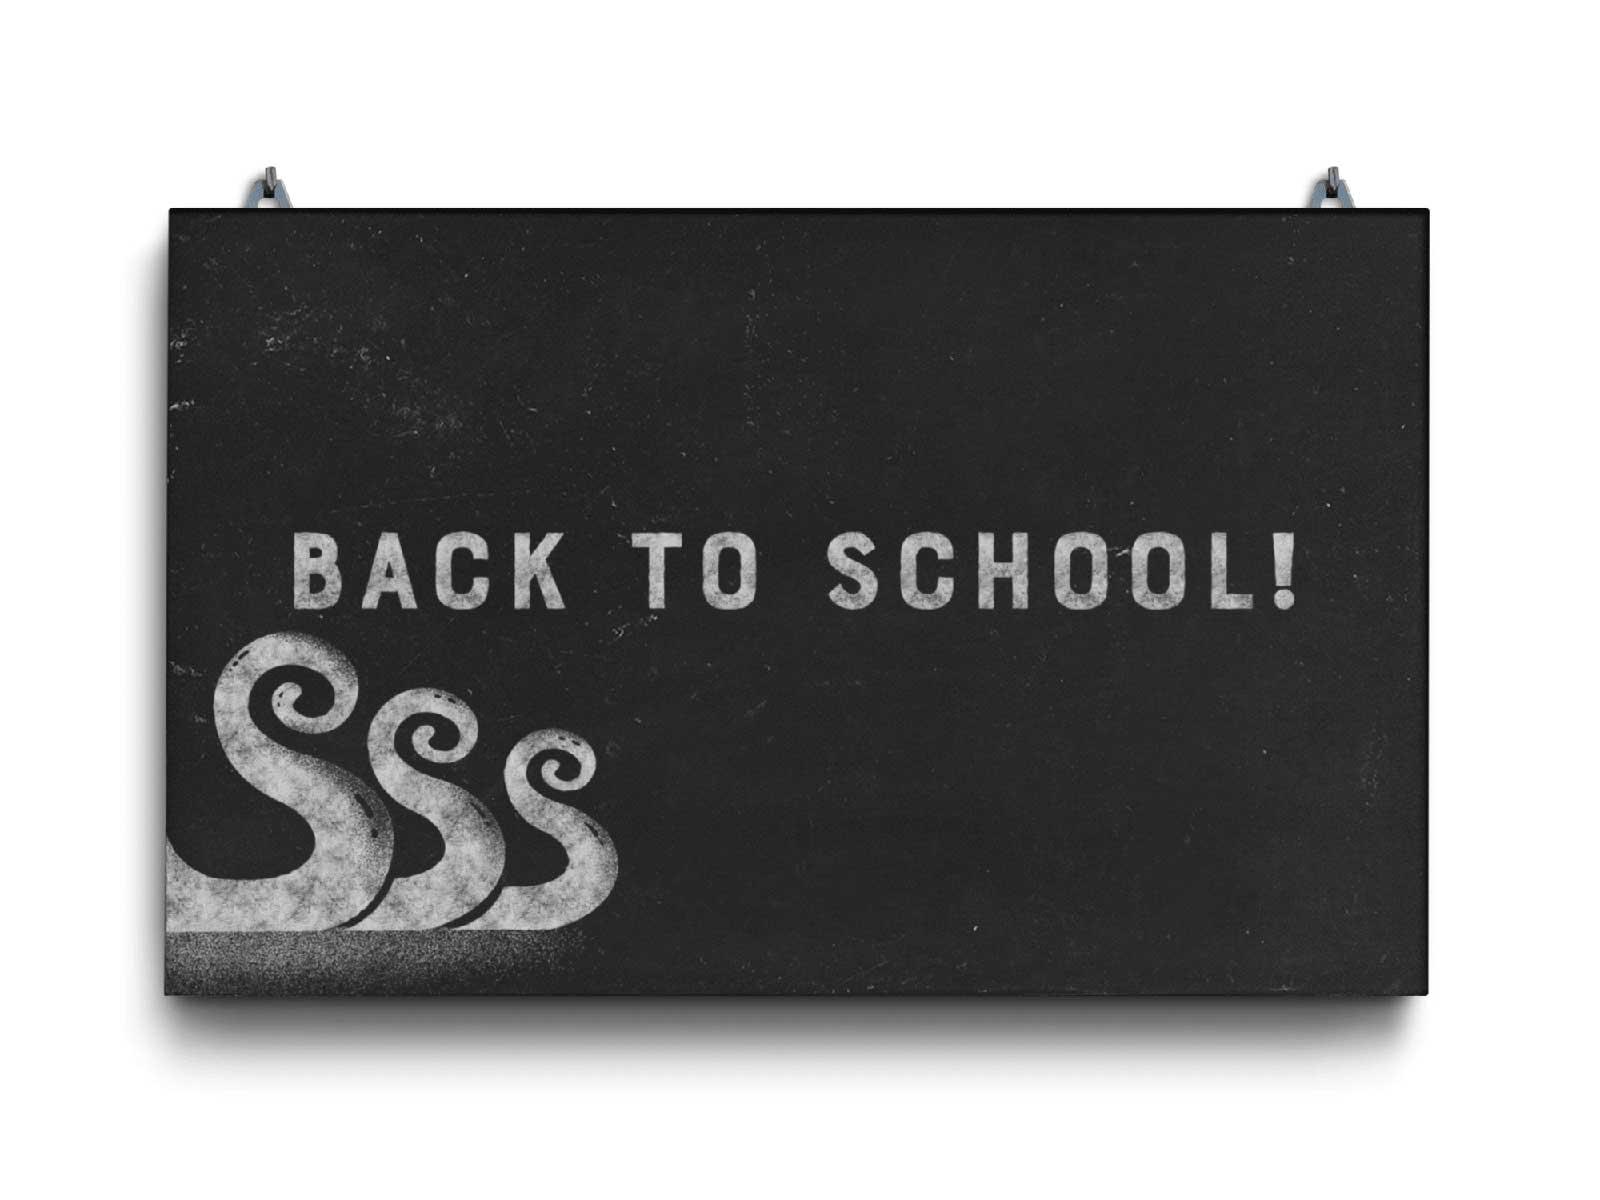 tentaworks-kassensystem-sacasy-schulung-back-to-school.jpg